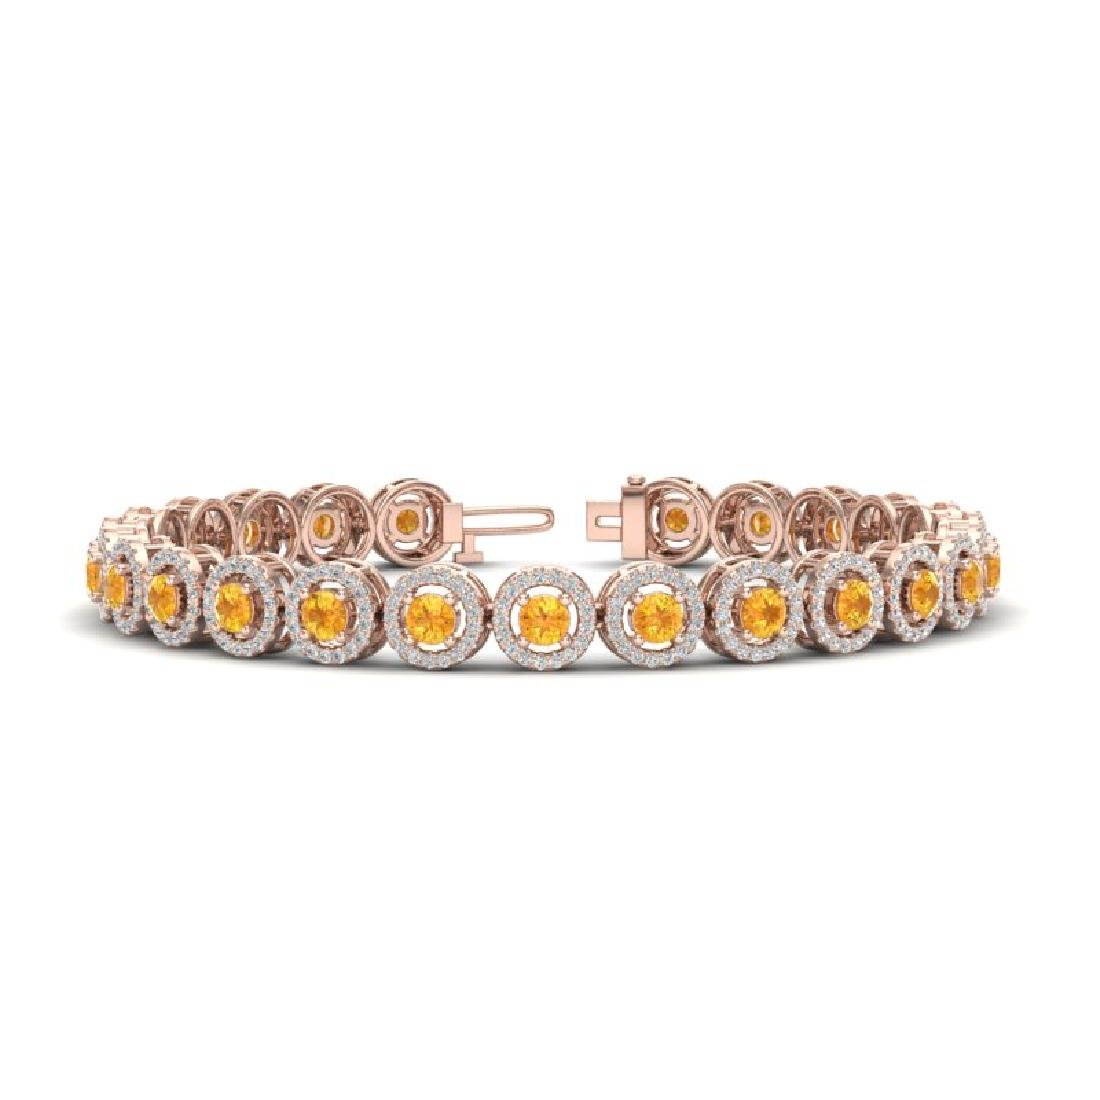 8.75 CTW Citrine & Micro Pave VS/SI Diamond Bracelet